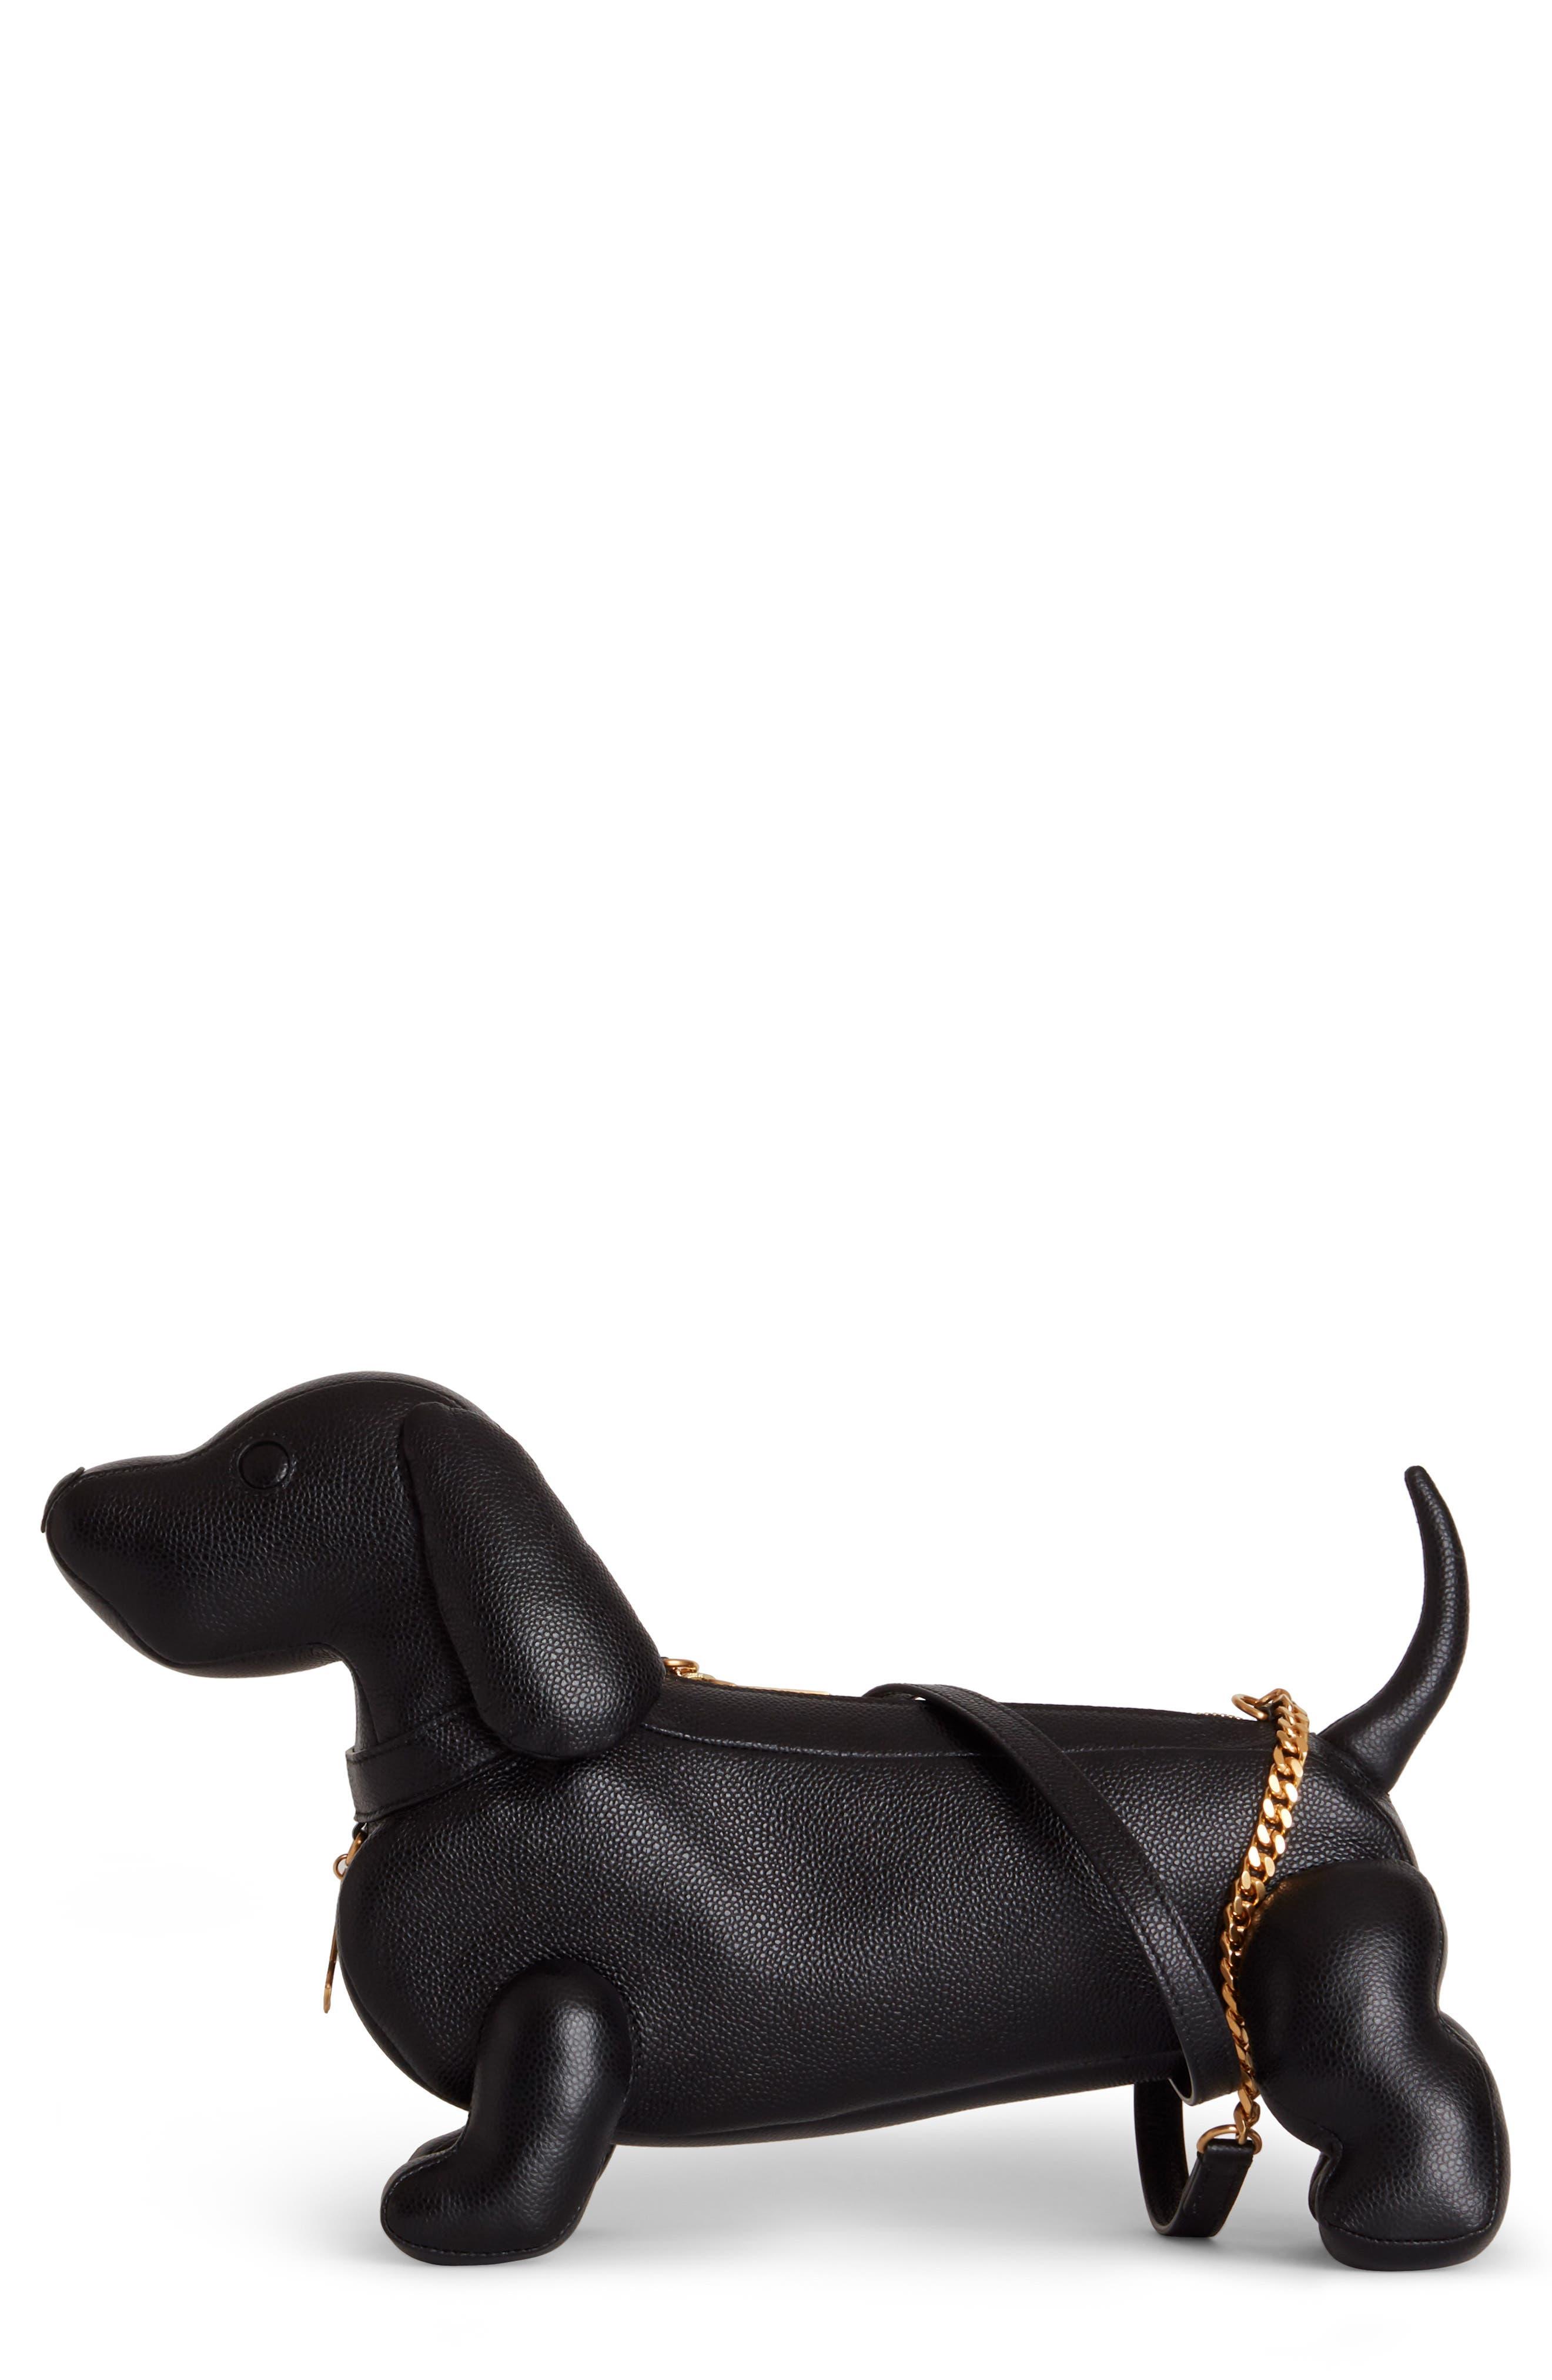 Mini Hector Leather Shoulder Bag,                             Main thumbnail 1, color,                             BLACK